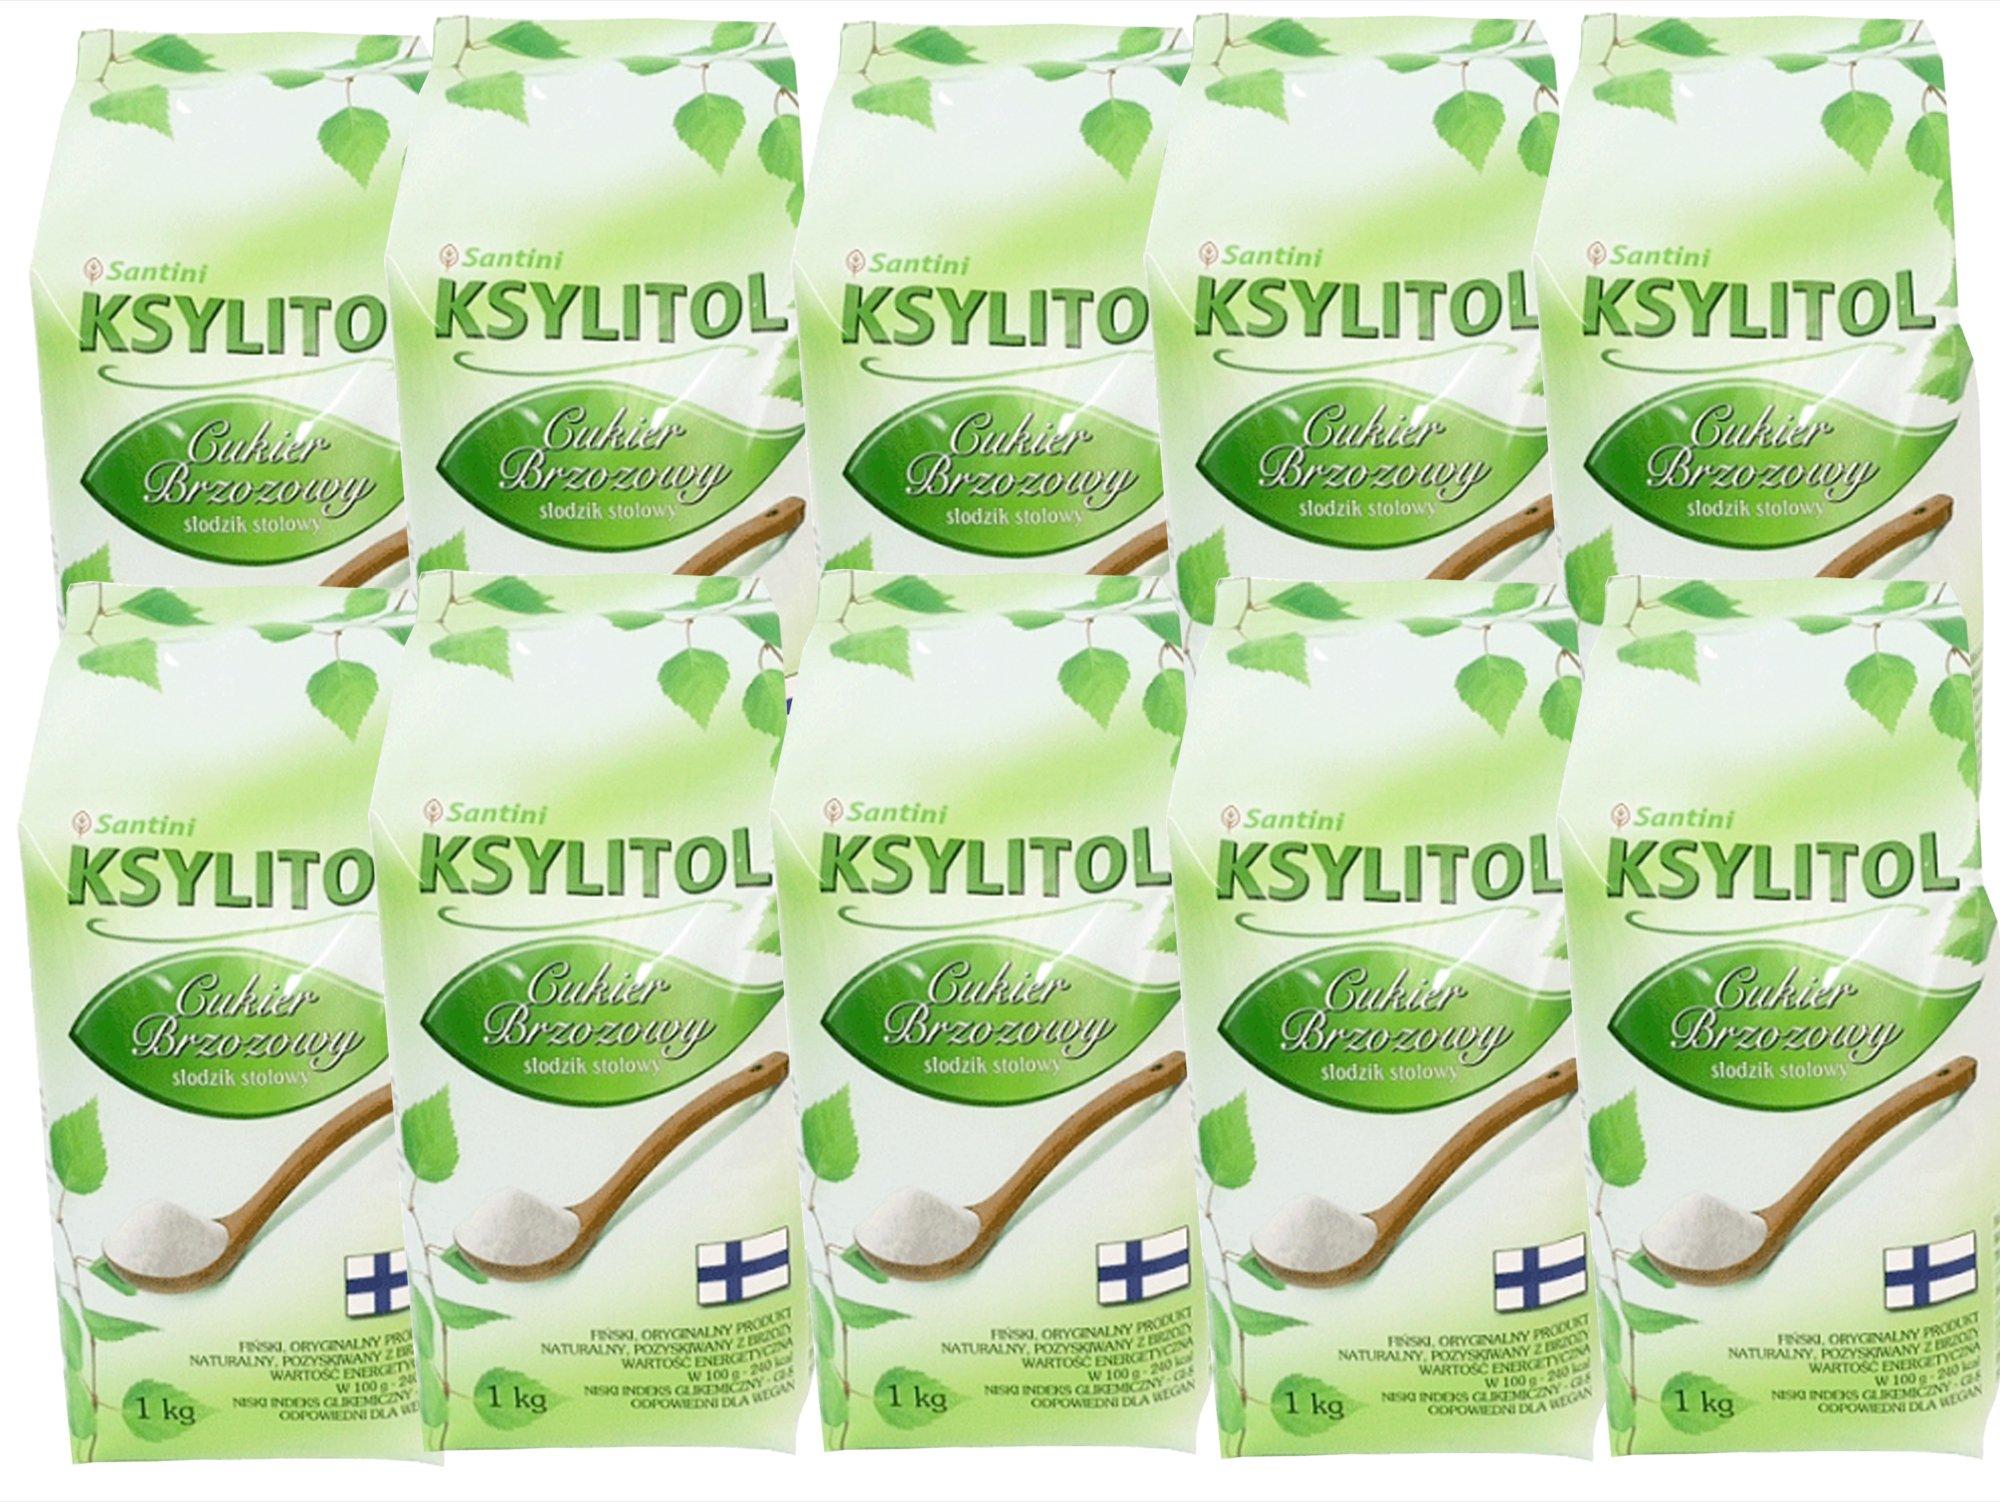 XYLITOL fínsky 10 kg 100% breza cukru, ekonomika